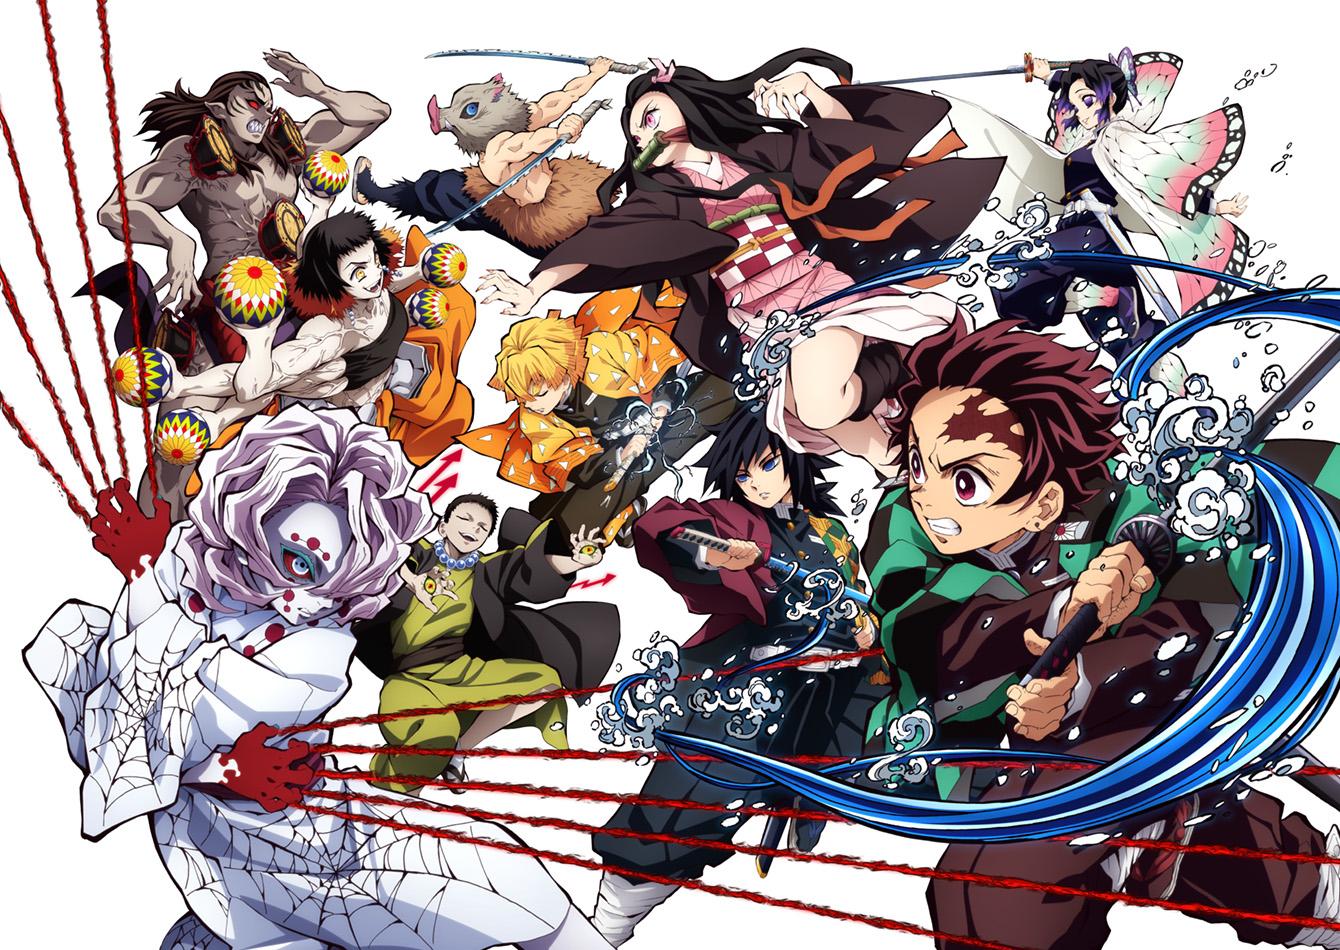 Demon Slayer Kimetsu No Yaiba Games Official Announcement Portal